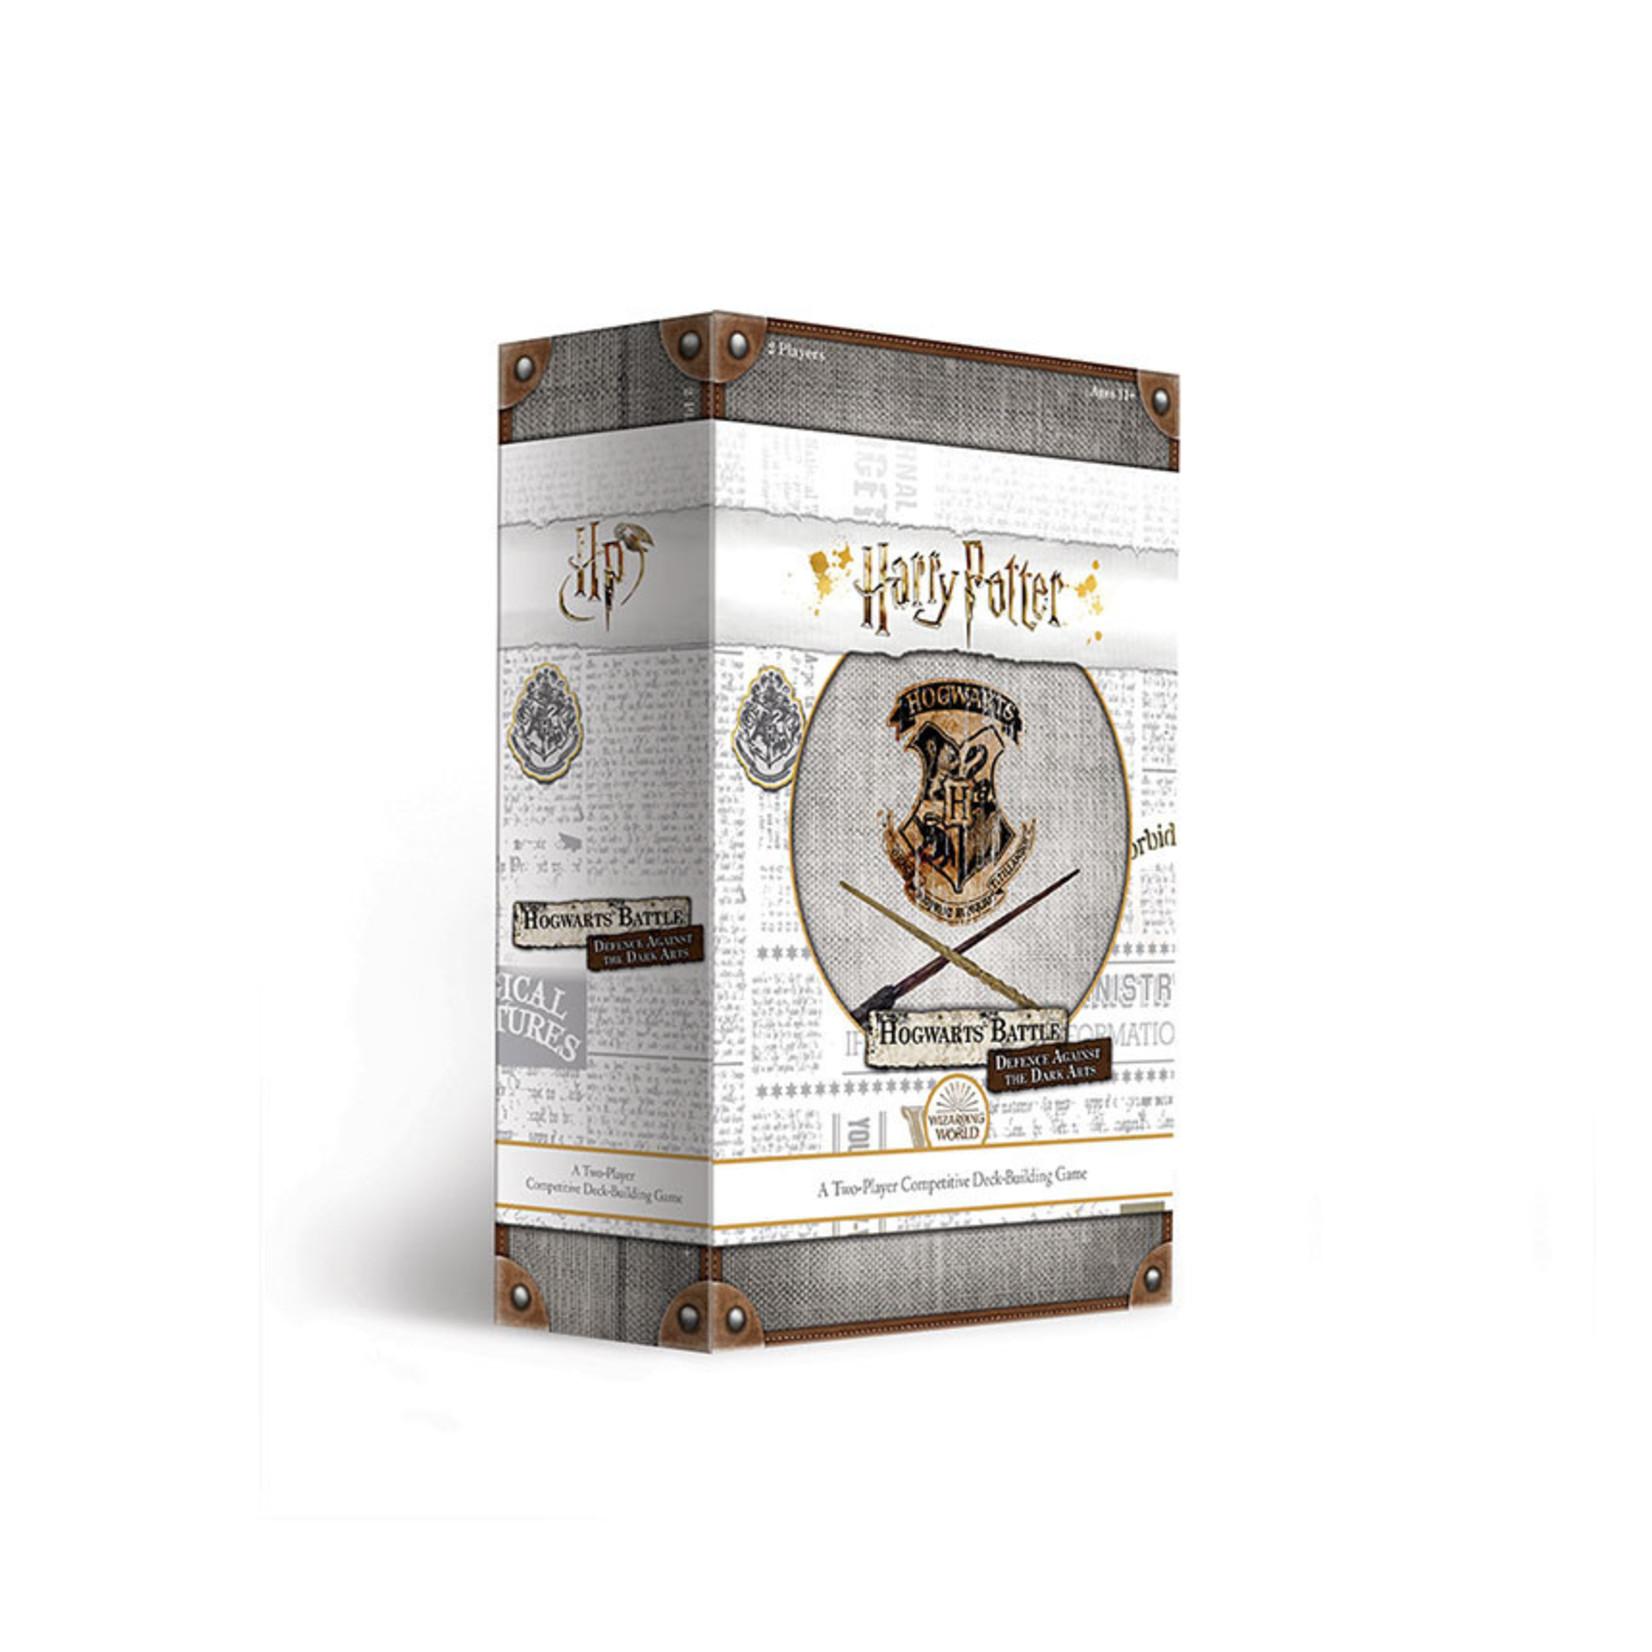 USAoploy Harry Potter Hogwarts Battle: Defense Against the Dark Arts